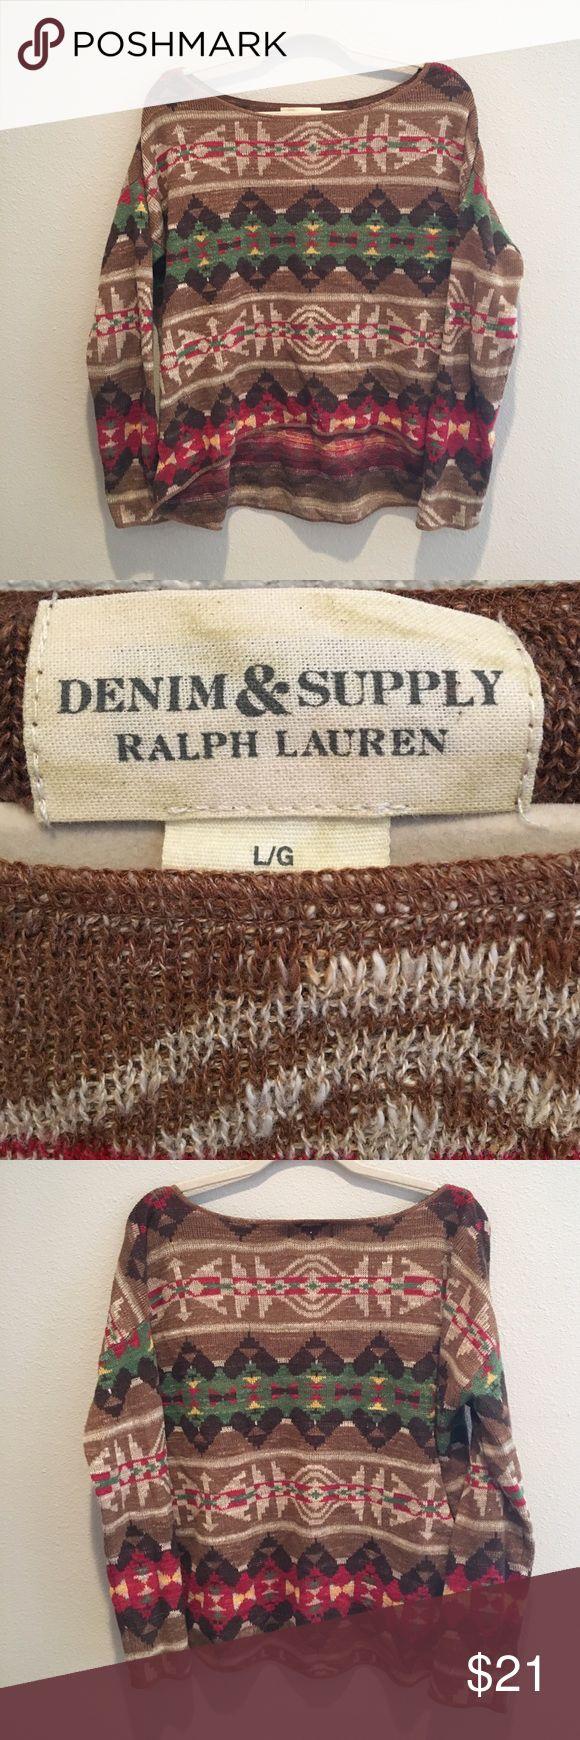 Denim & Supply Ralph Lauren Tribal Sweater Denim & Supply Ralph Lauren Tribal Sweater Worn Once Size Large **Garments Will Be Steamed Before Shipping** Denim & Supply Ralph Lauren Sweaters Crew & Scoop Necks